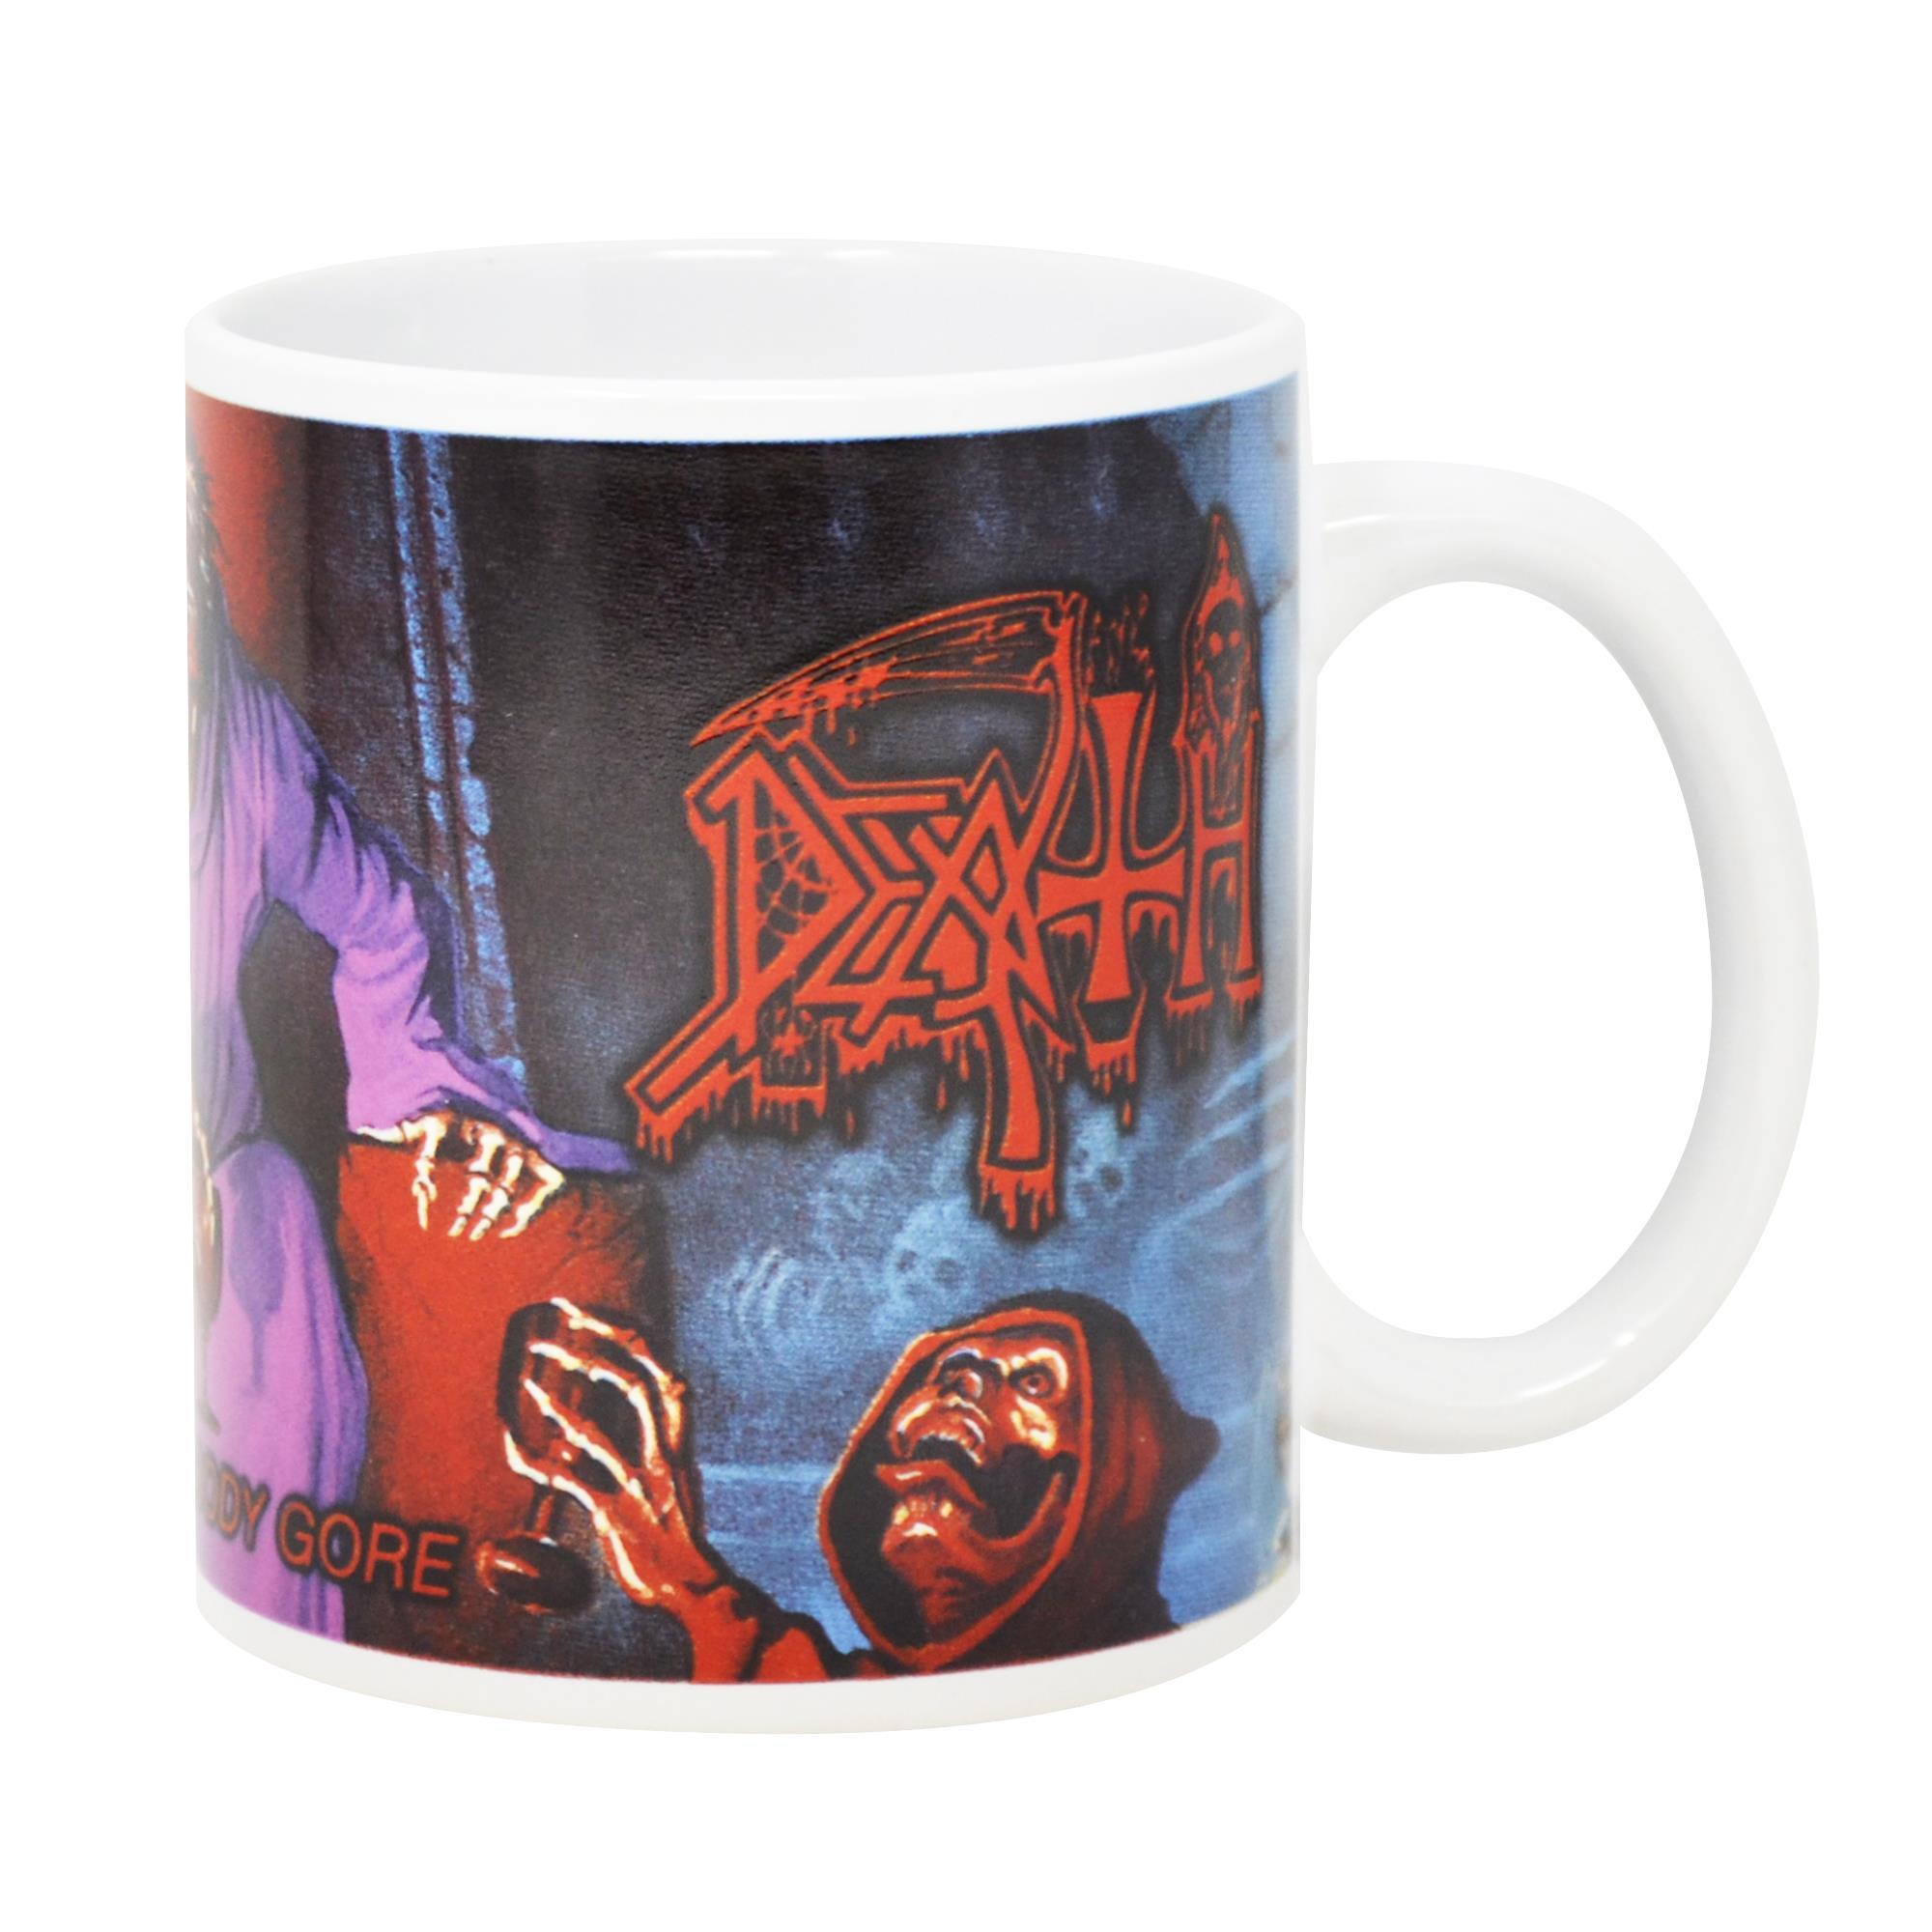 The Goblet Of Gore Mug